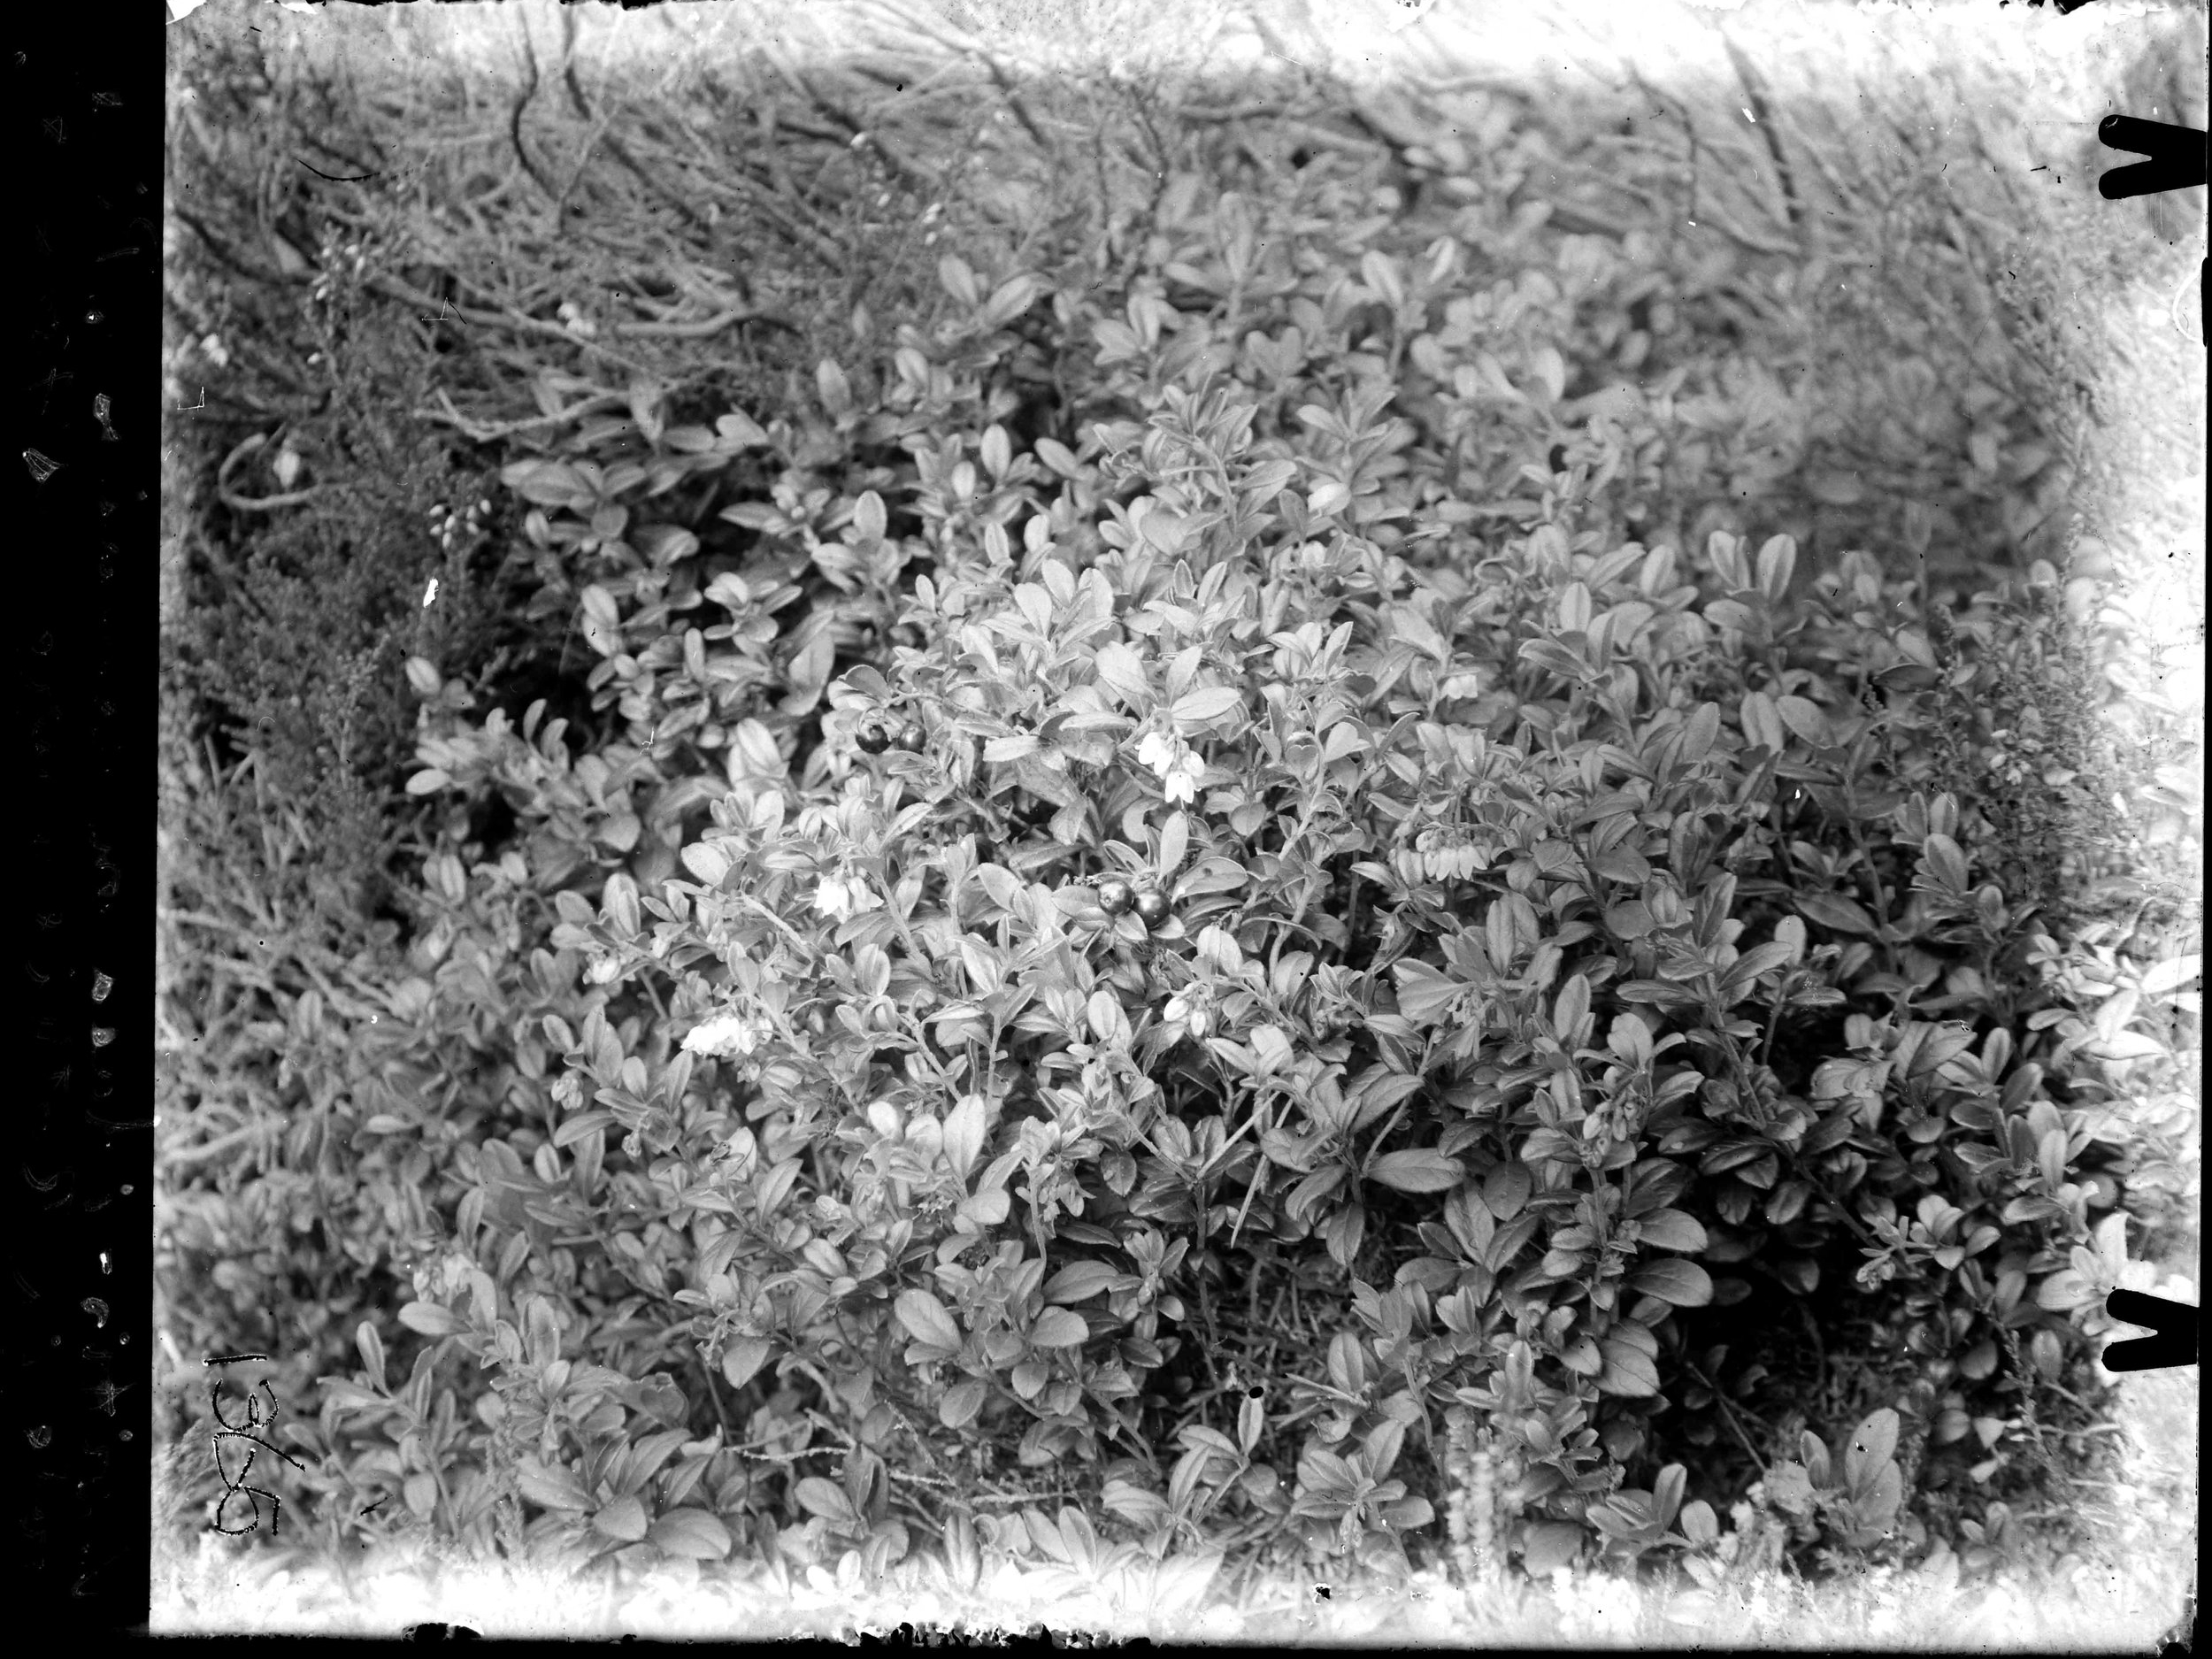 3_EJS_V.-vitis-idaea-on-remains-of-pine-bole-in-Rothiemurchus-forest_1365_mini.jpg